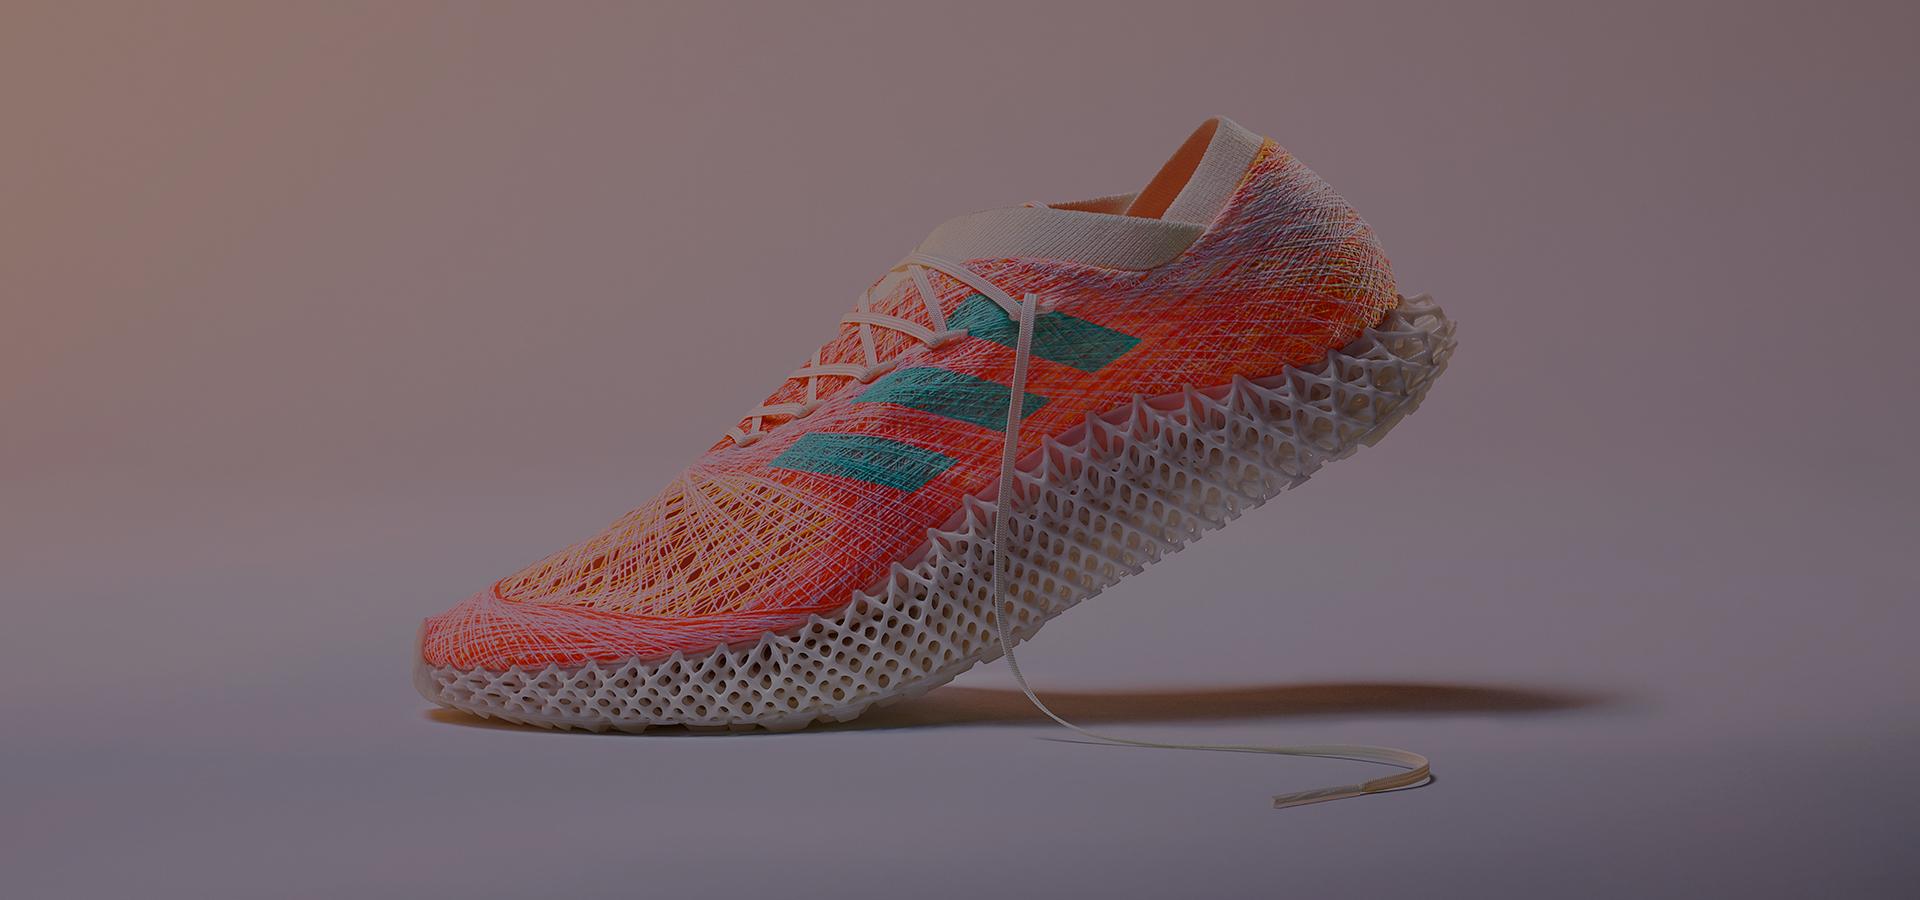 adidas x Have A Good Time Kollektion – Sneaker & Lifestyle